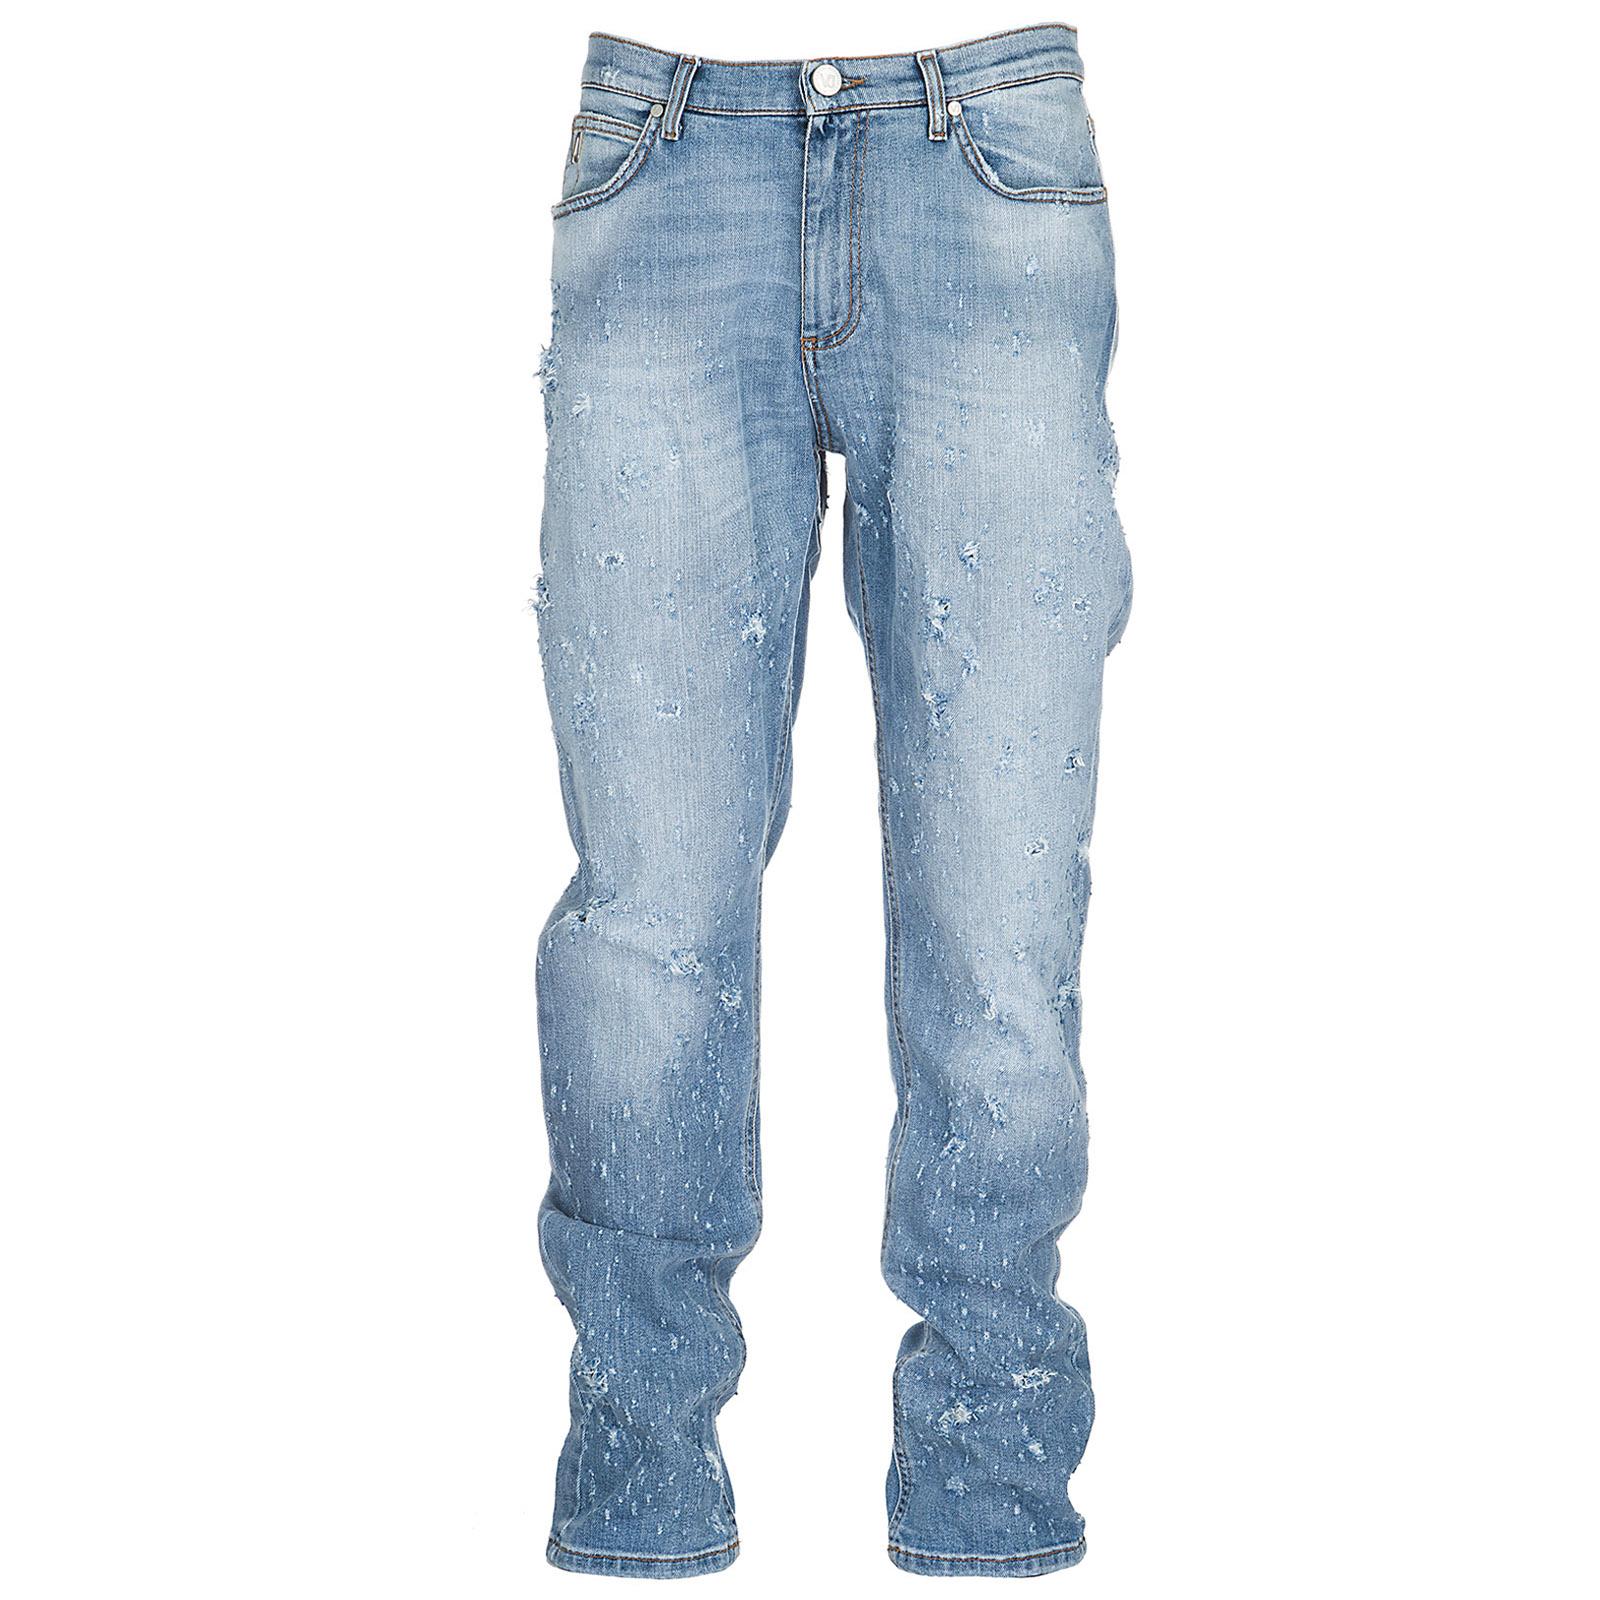 c84d2ec7d3 Jeans uomo